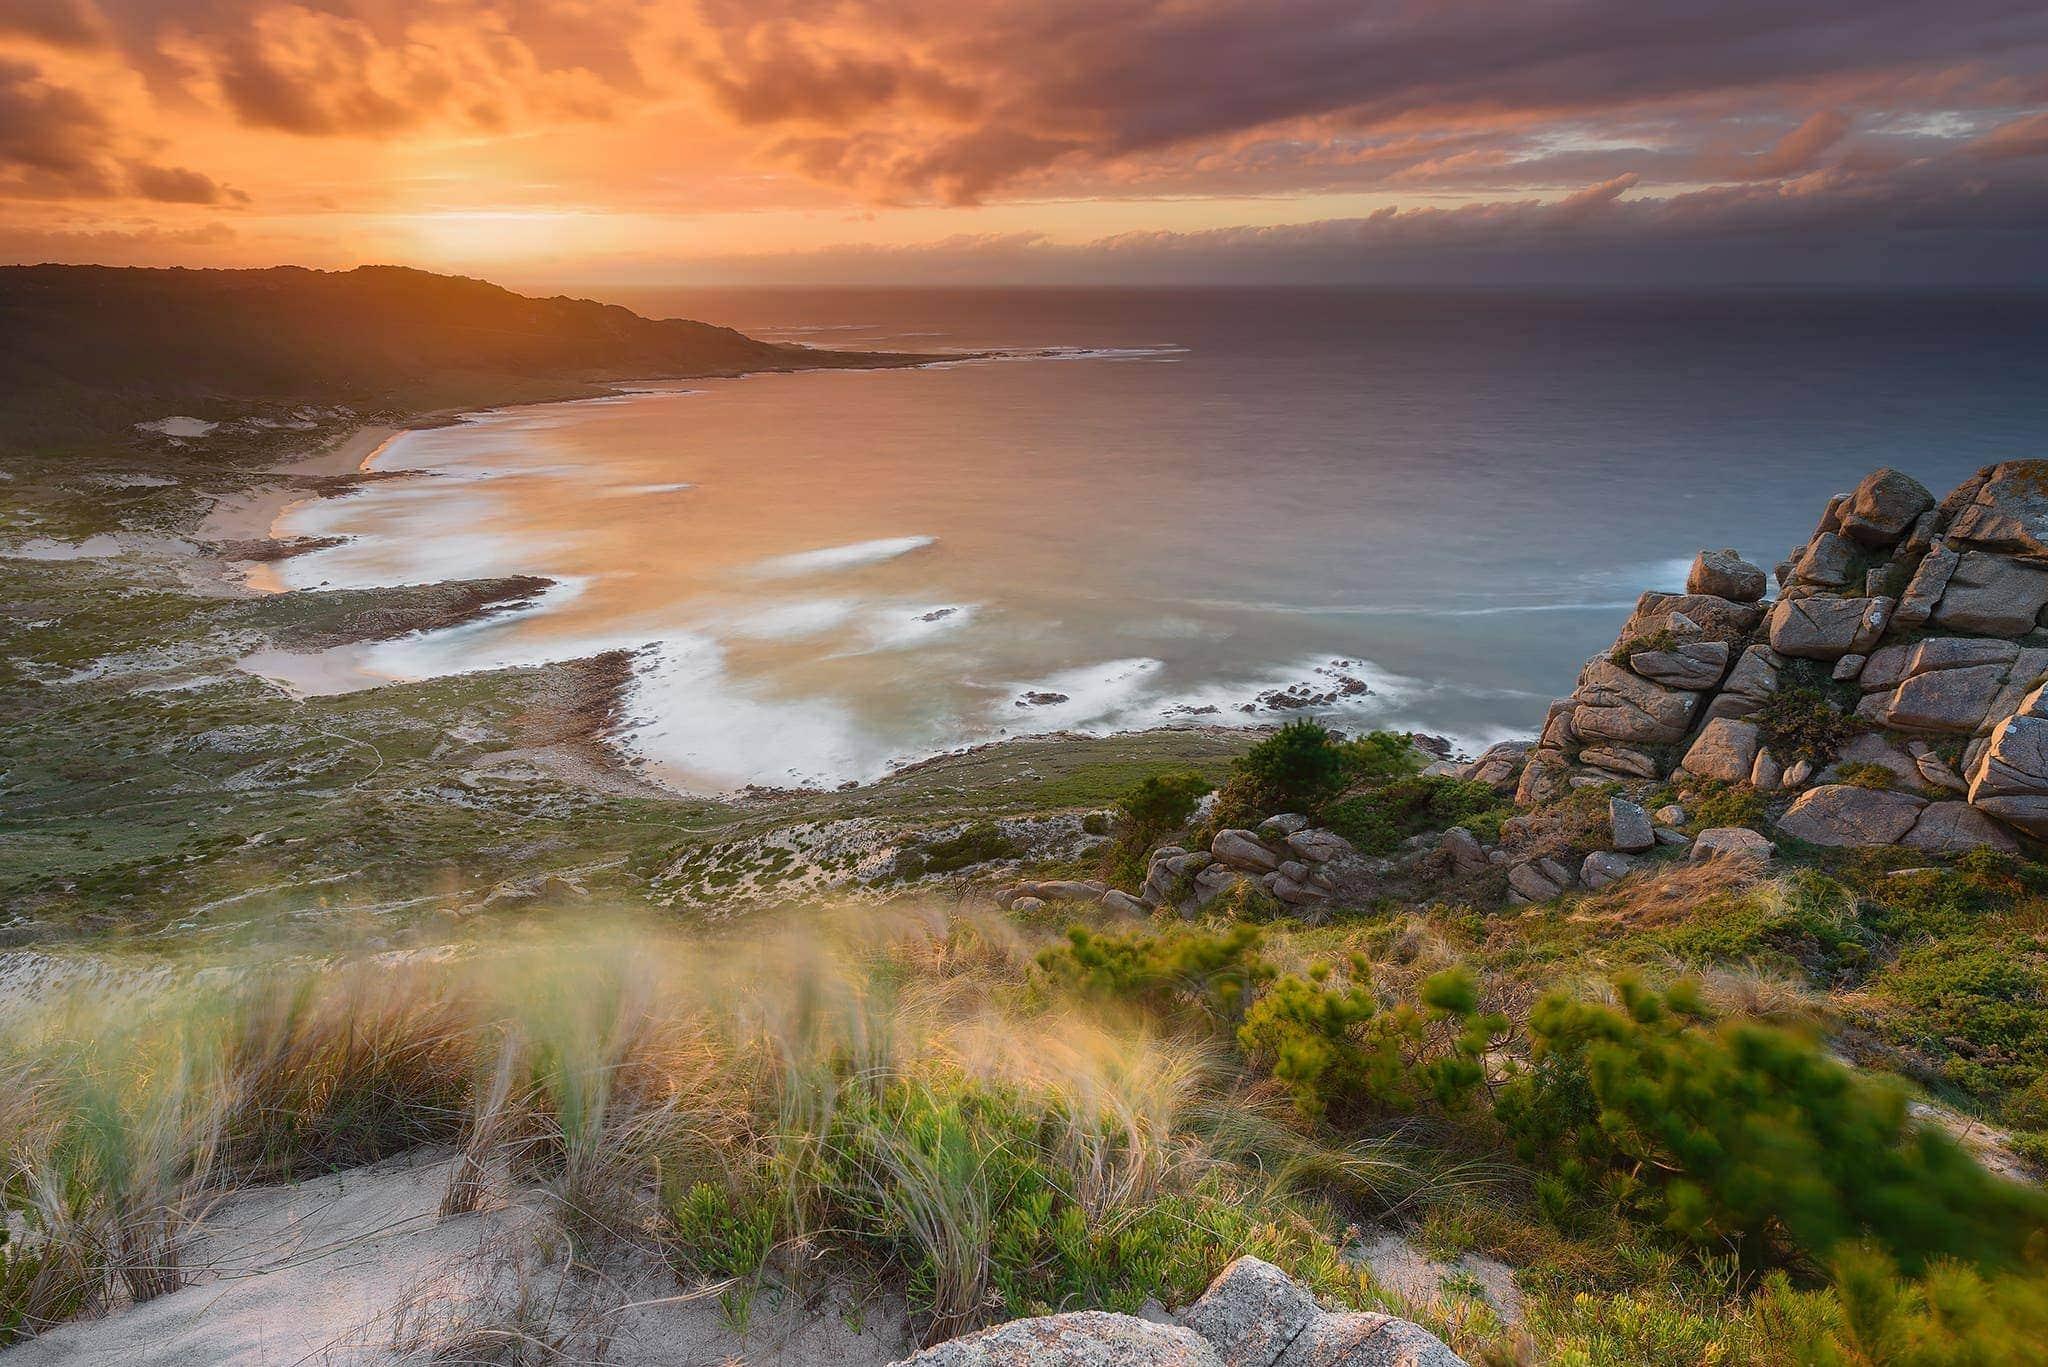 Francesco Gola Seascape Landscape Photography Spain Galizia Galicia Espana Long Exposure